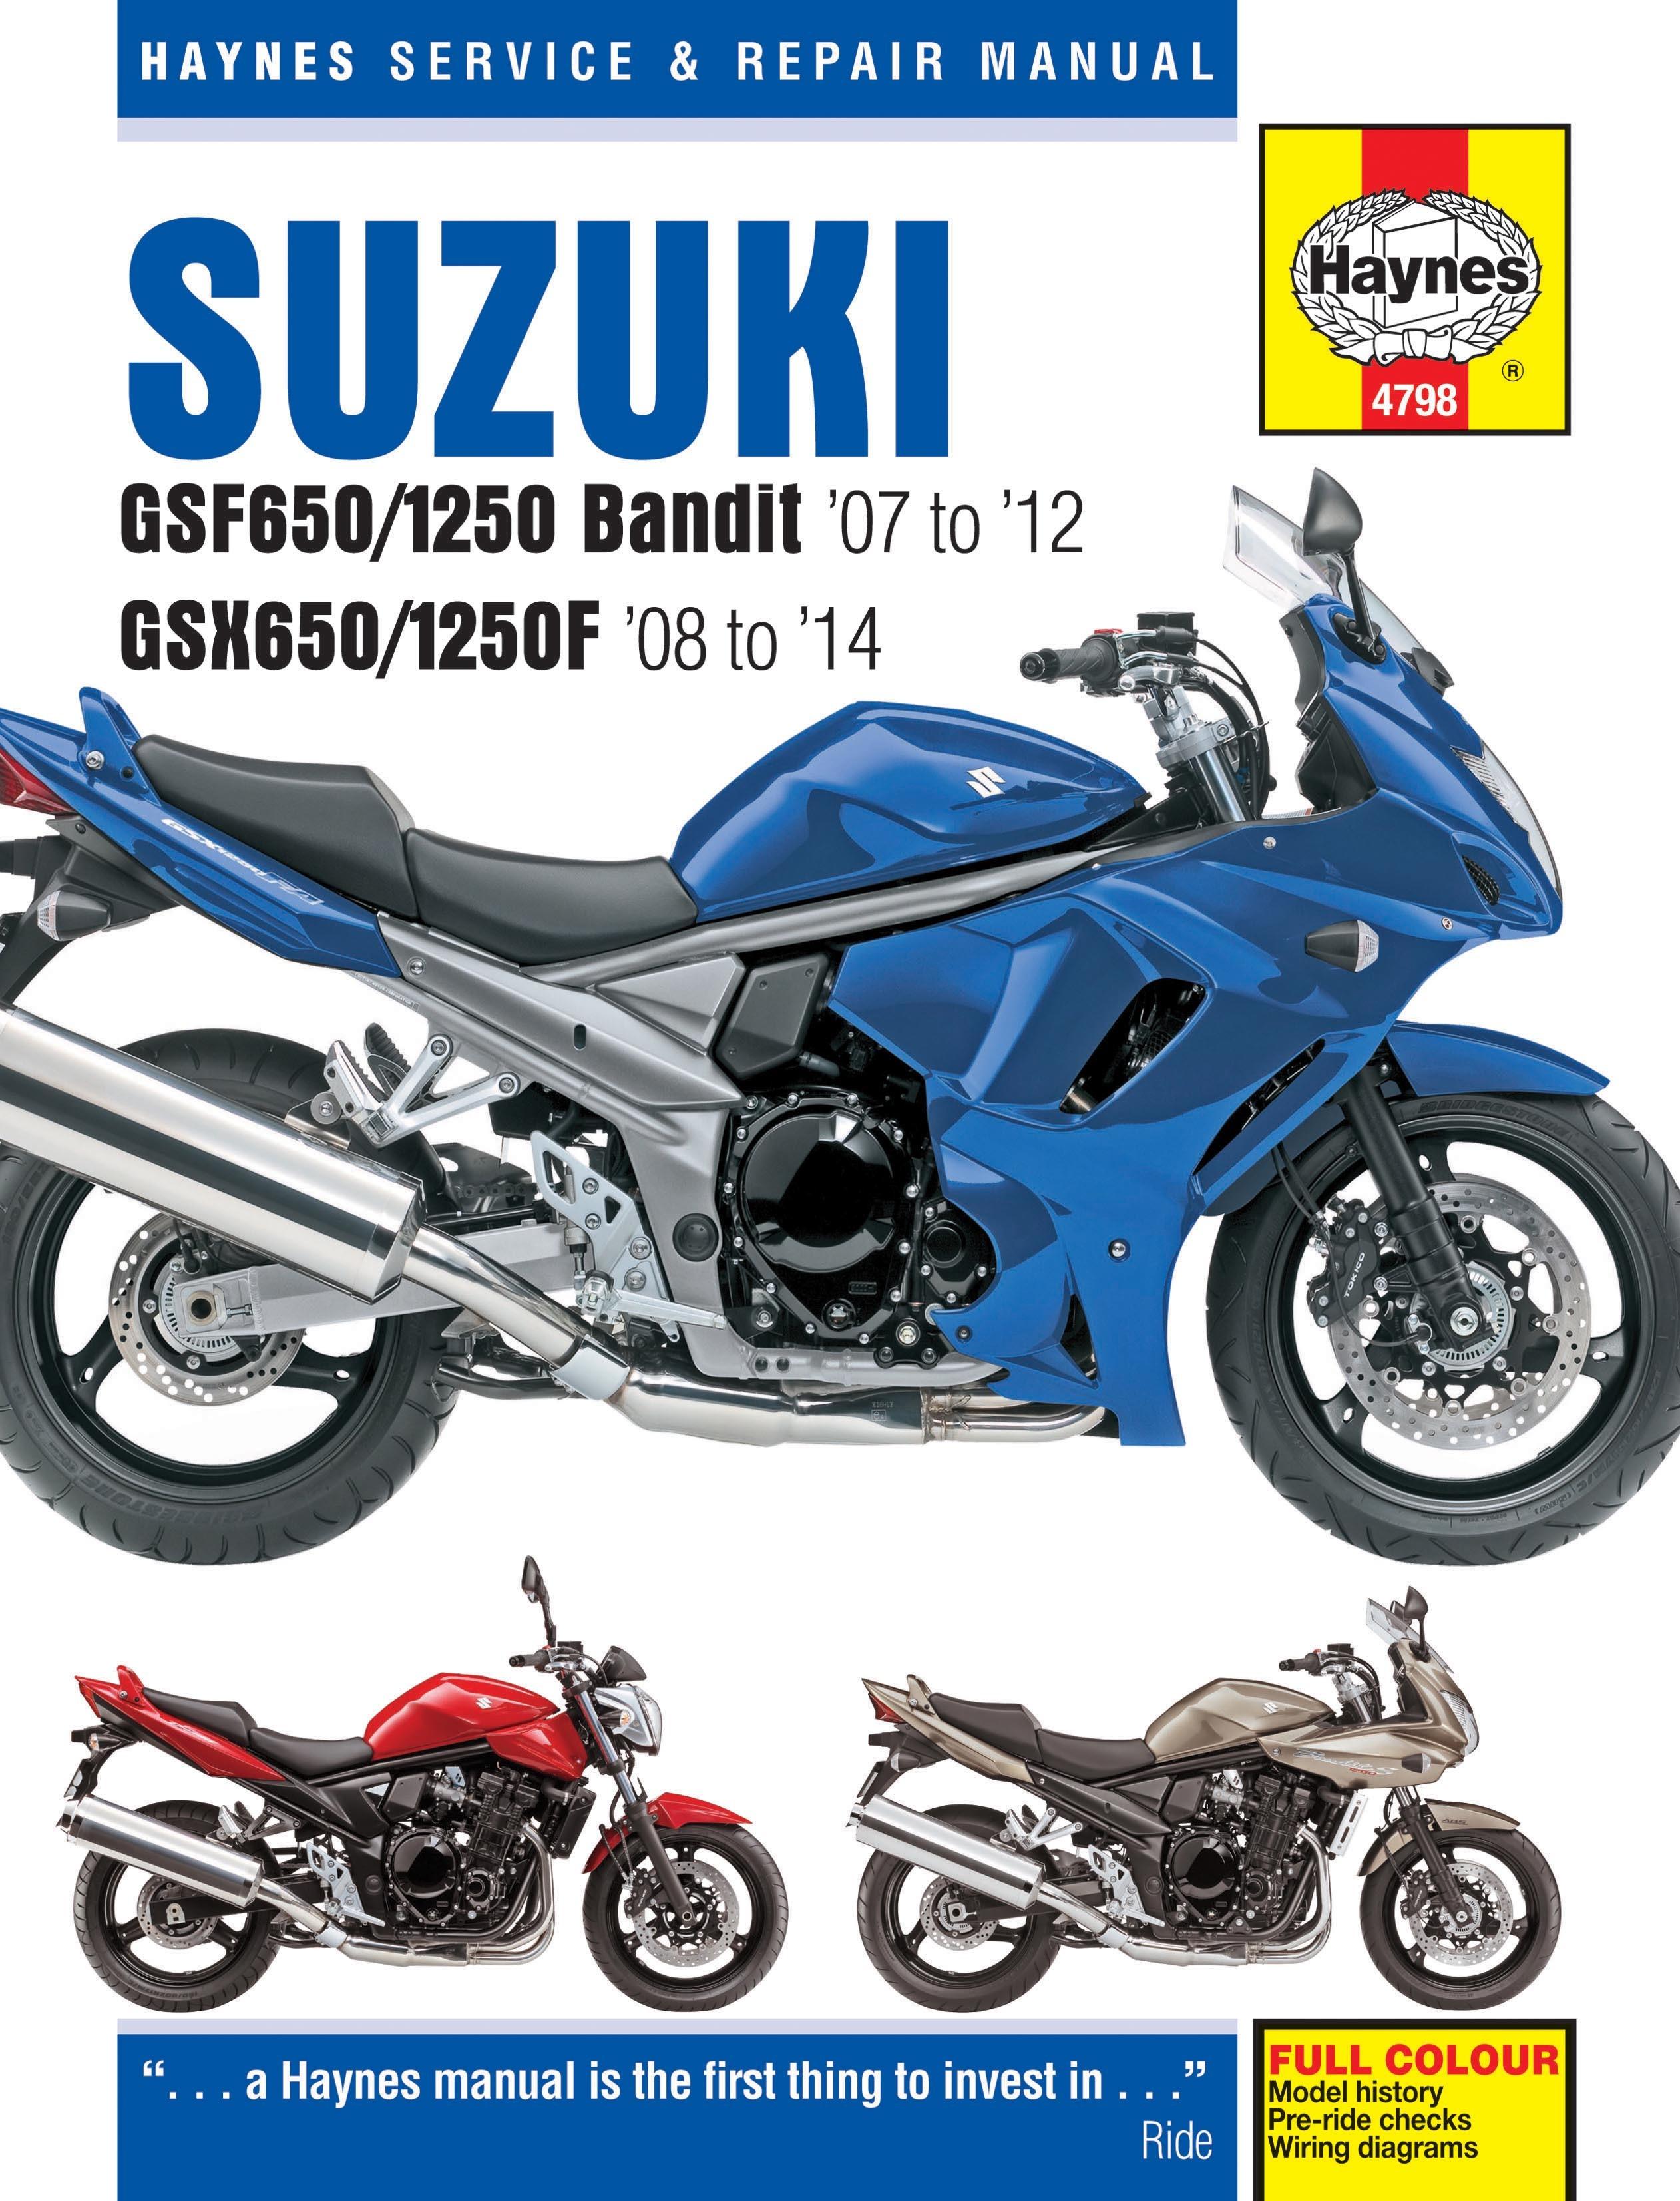 haynes manuals just bandits rh justbandits com suzuki gsx 1250 fa manual pdf suzuki bandit 1250 user manual